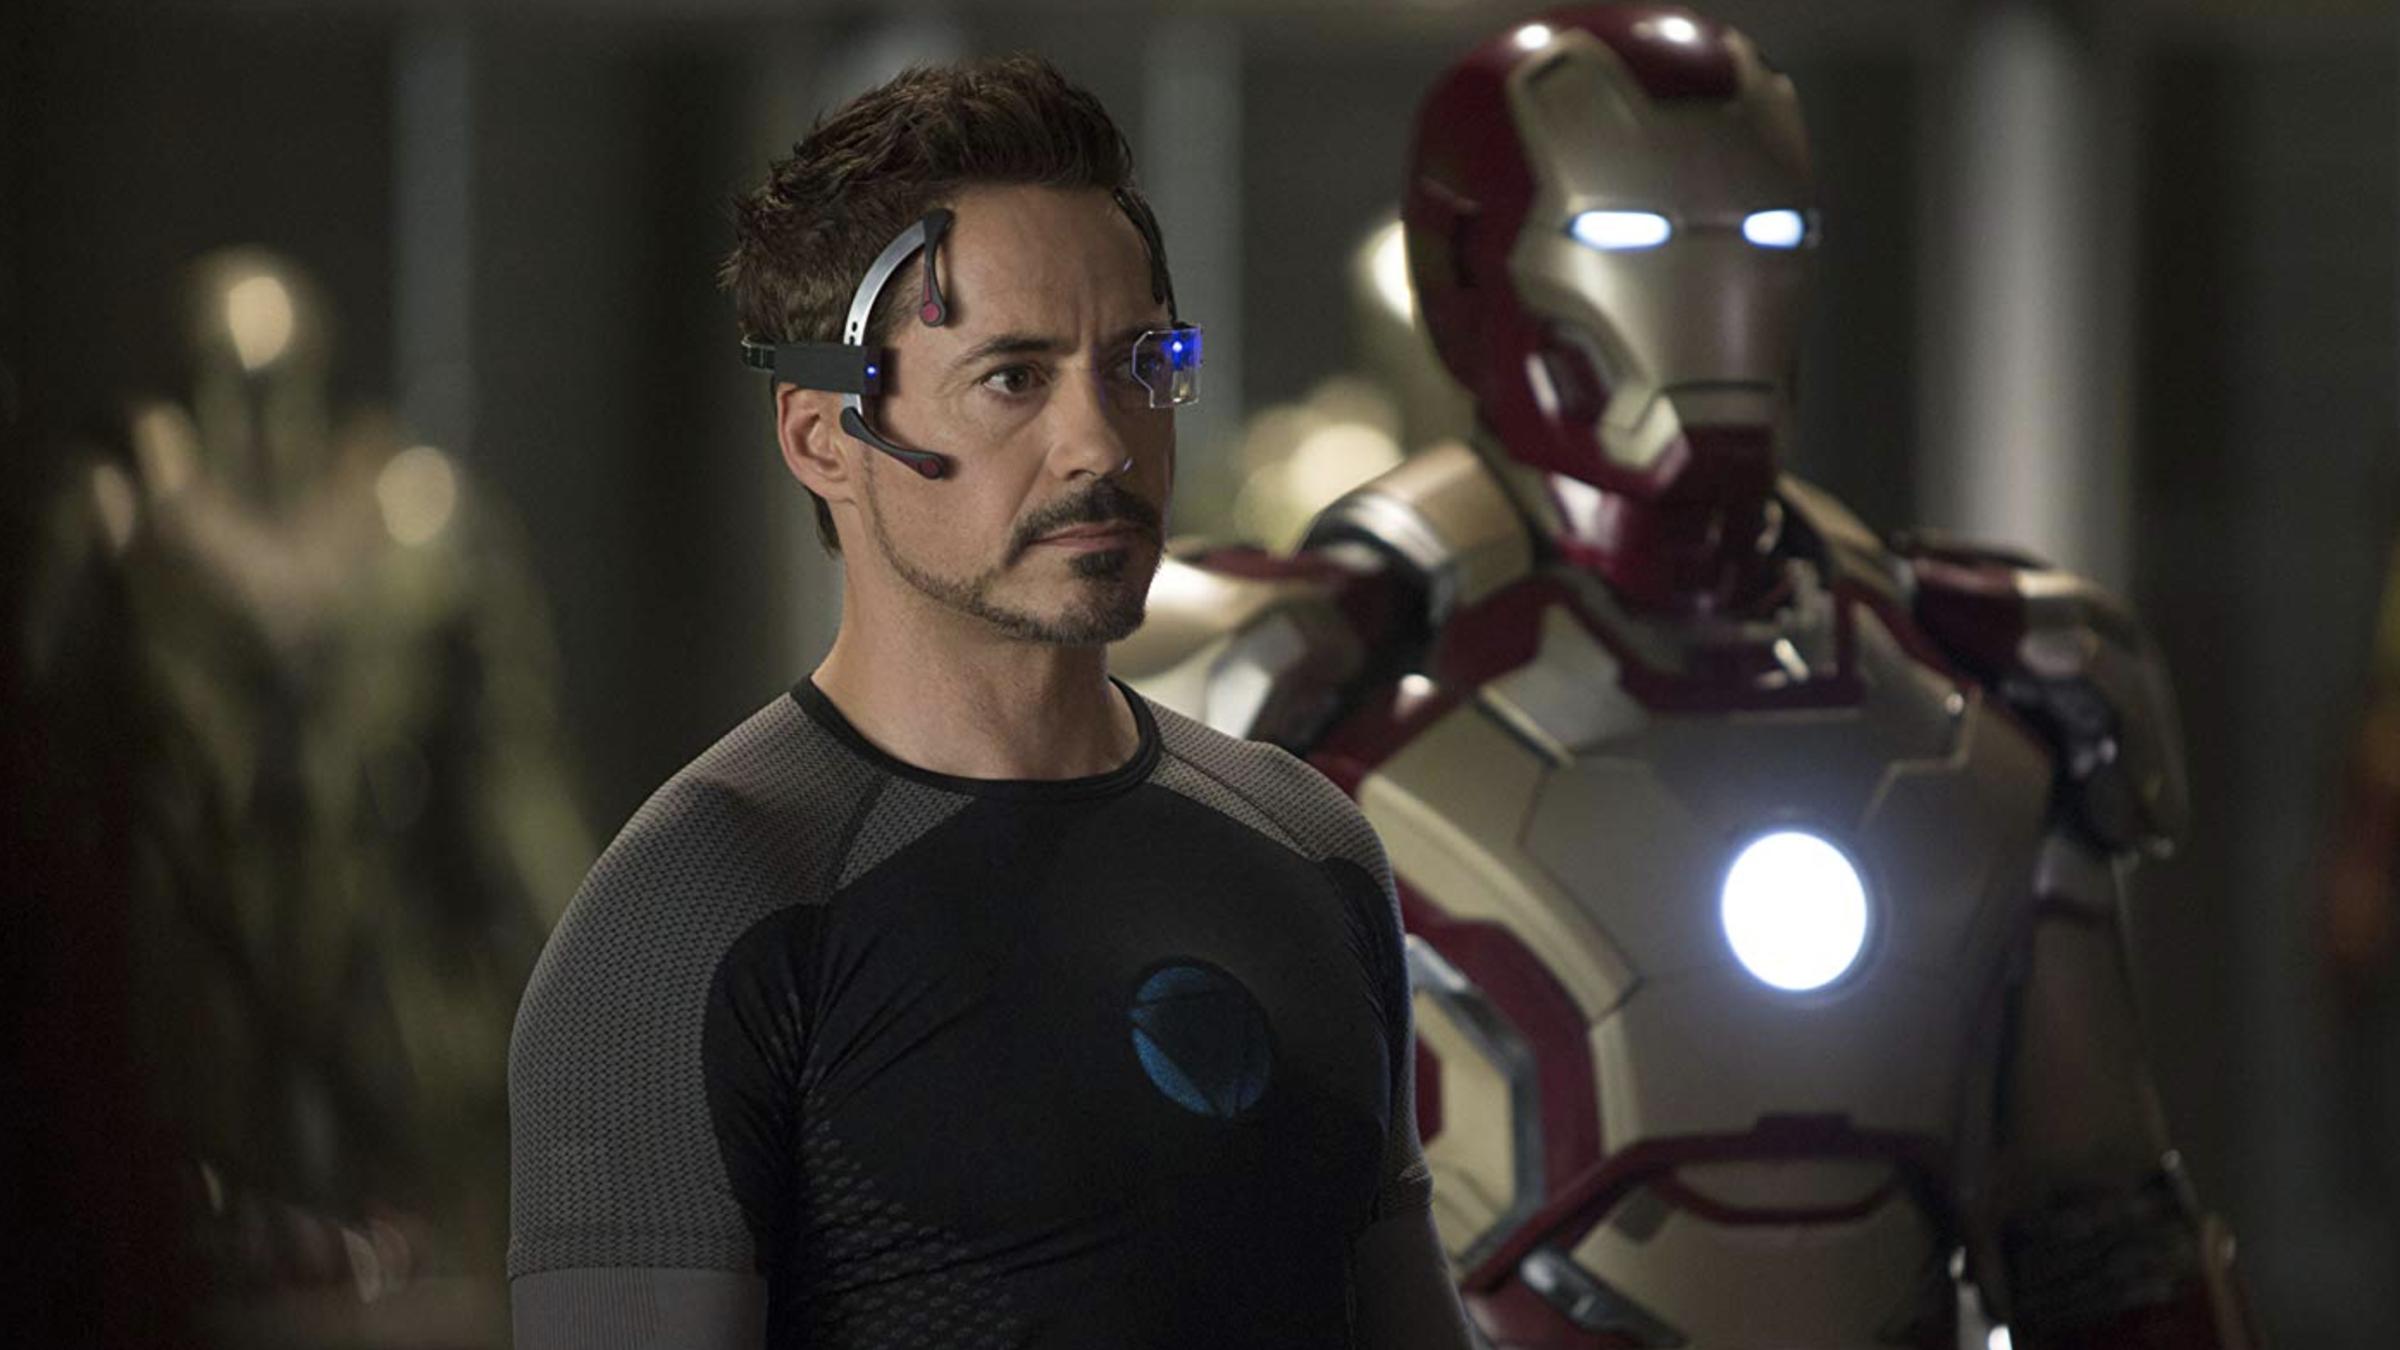 8200 Koleksi Gambar Iron Man Hd Gratis Terbaik